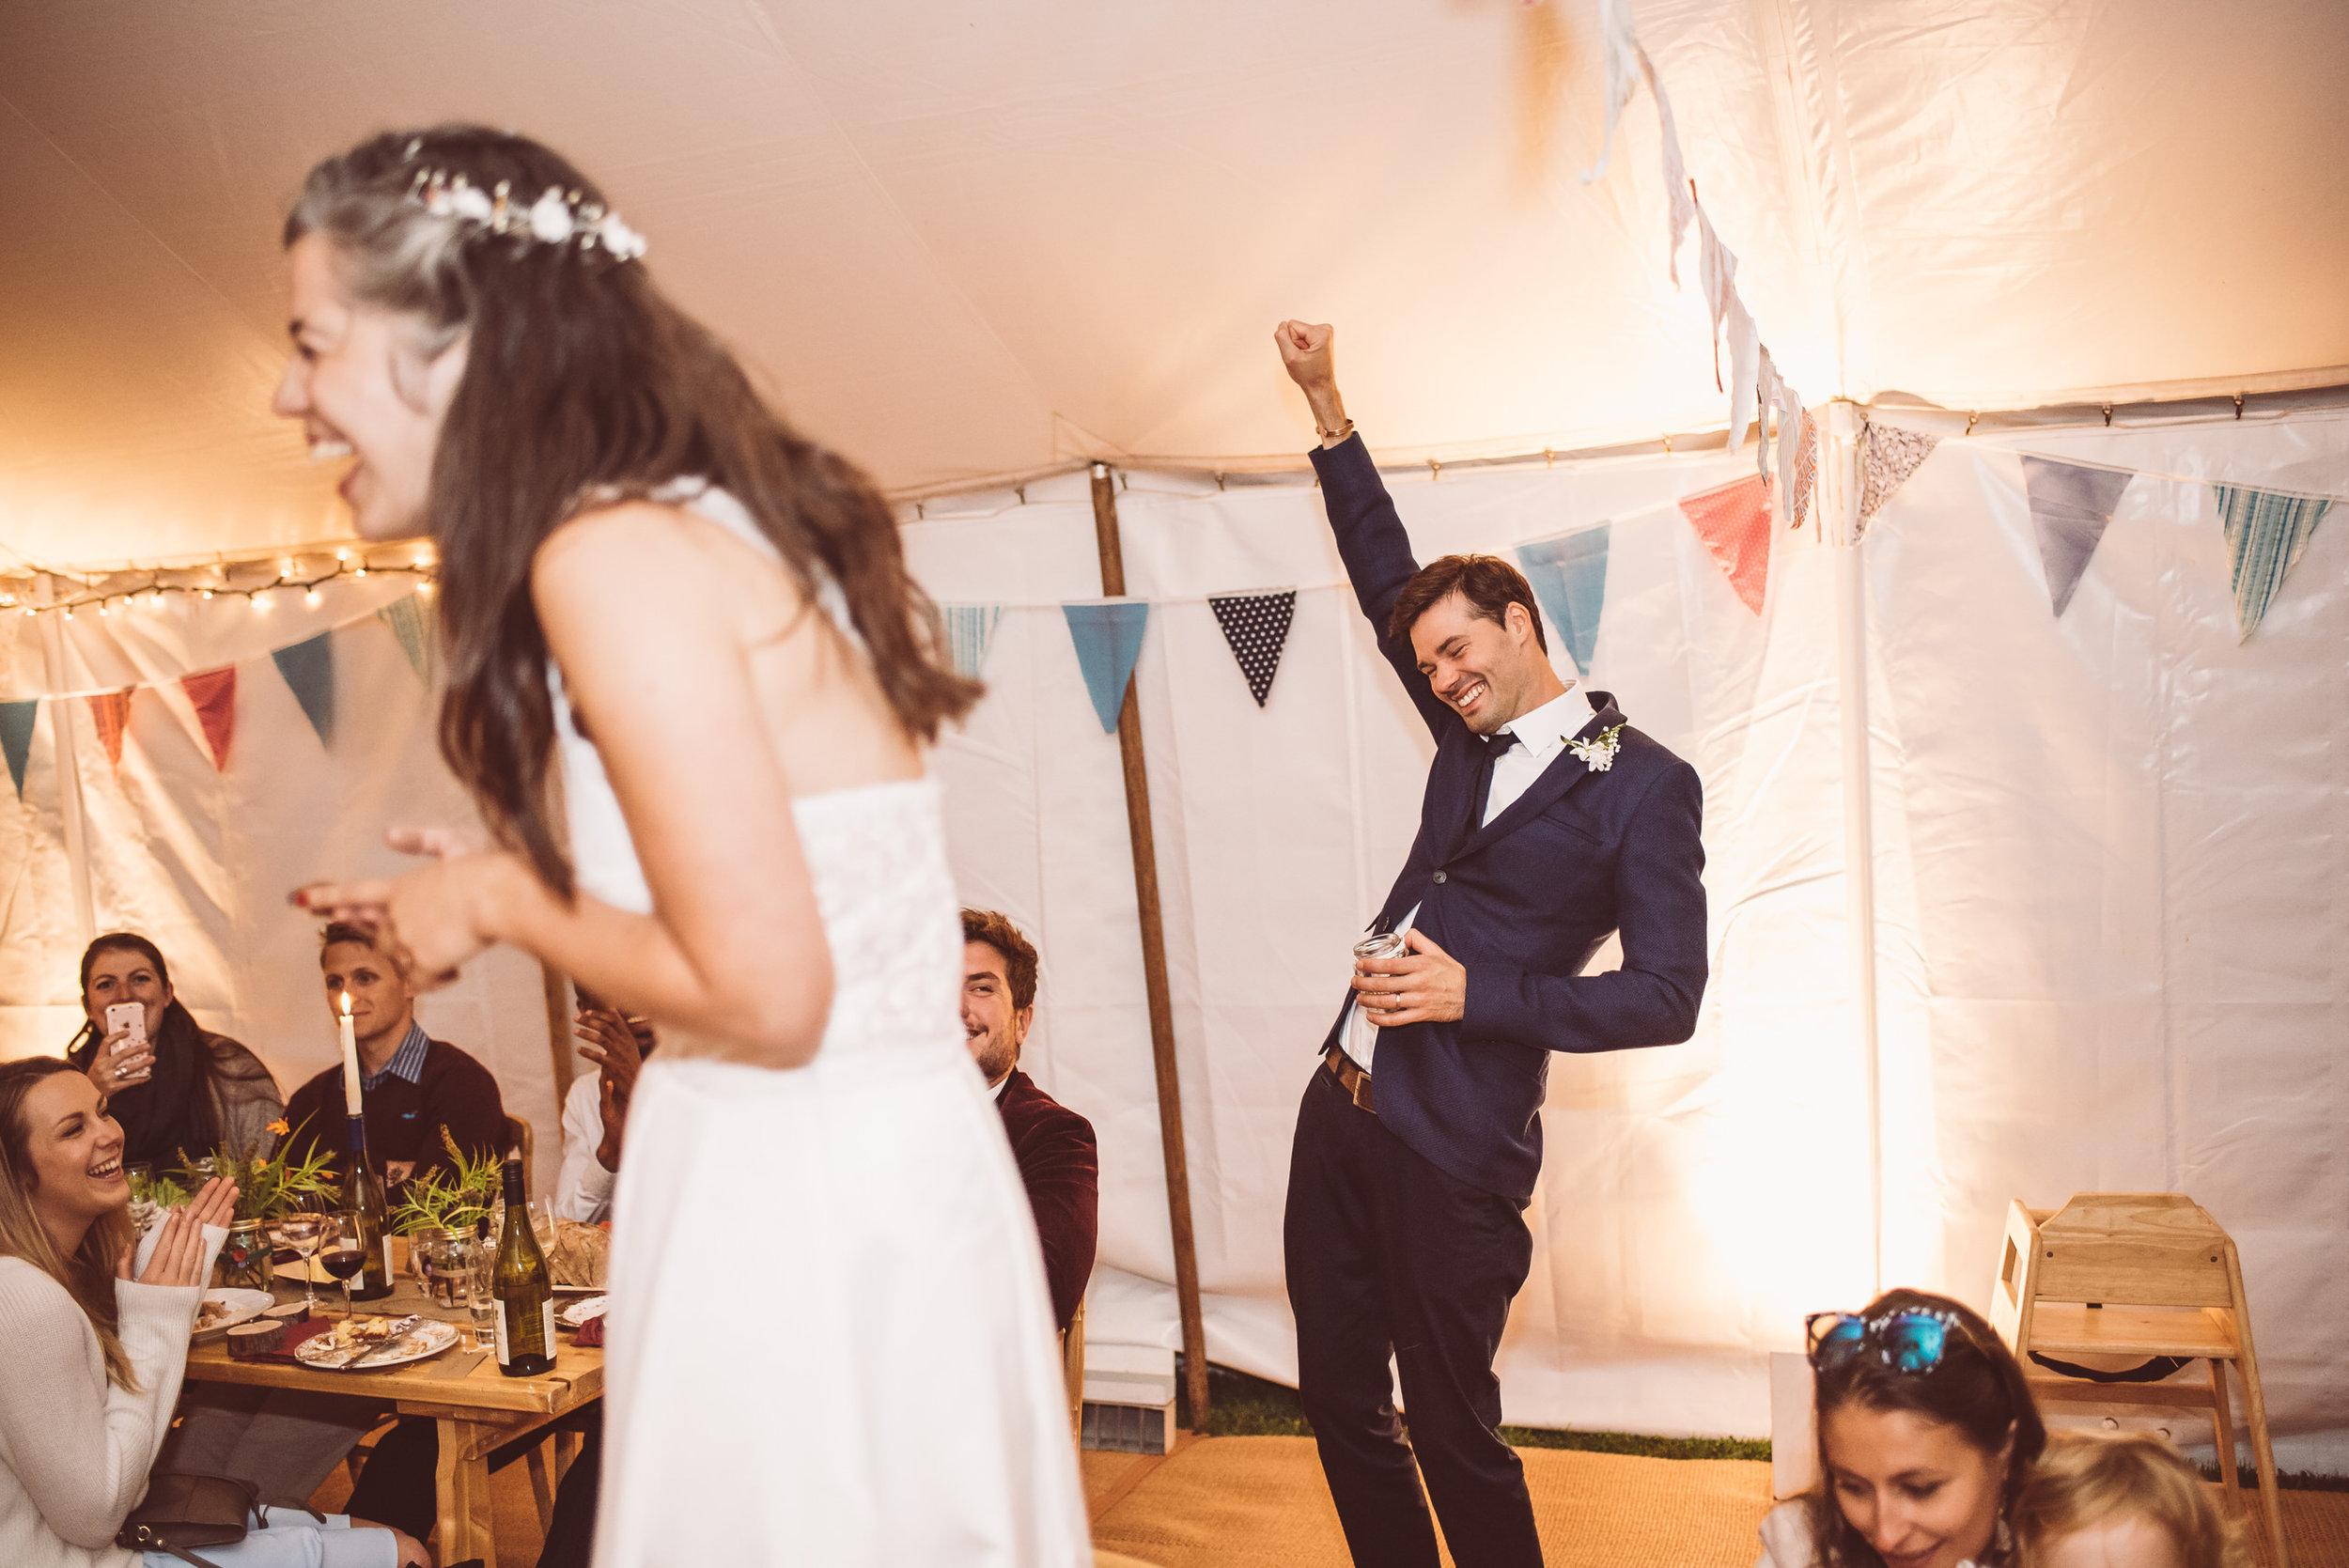 knepp-castle-boho-outdoor-wedding-644.jpg